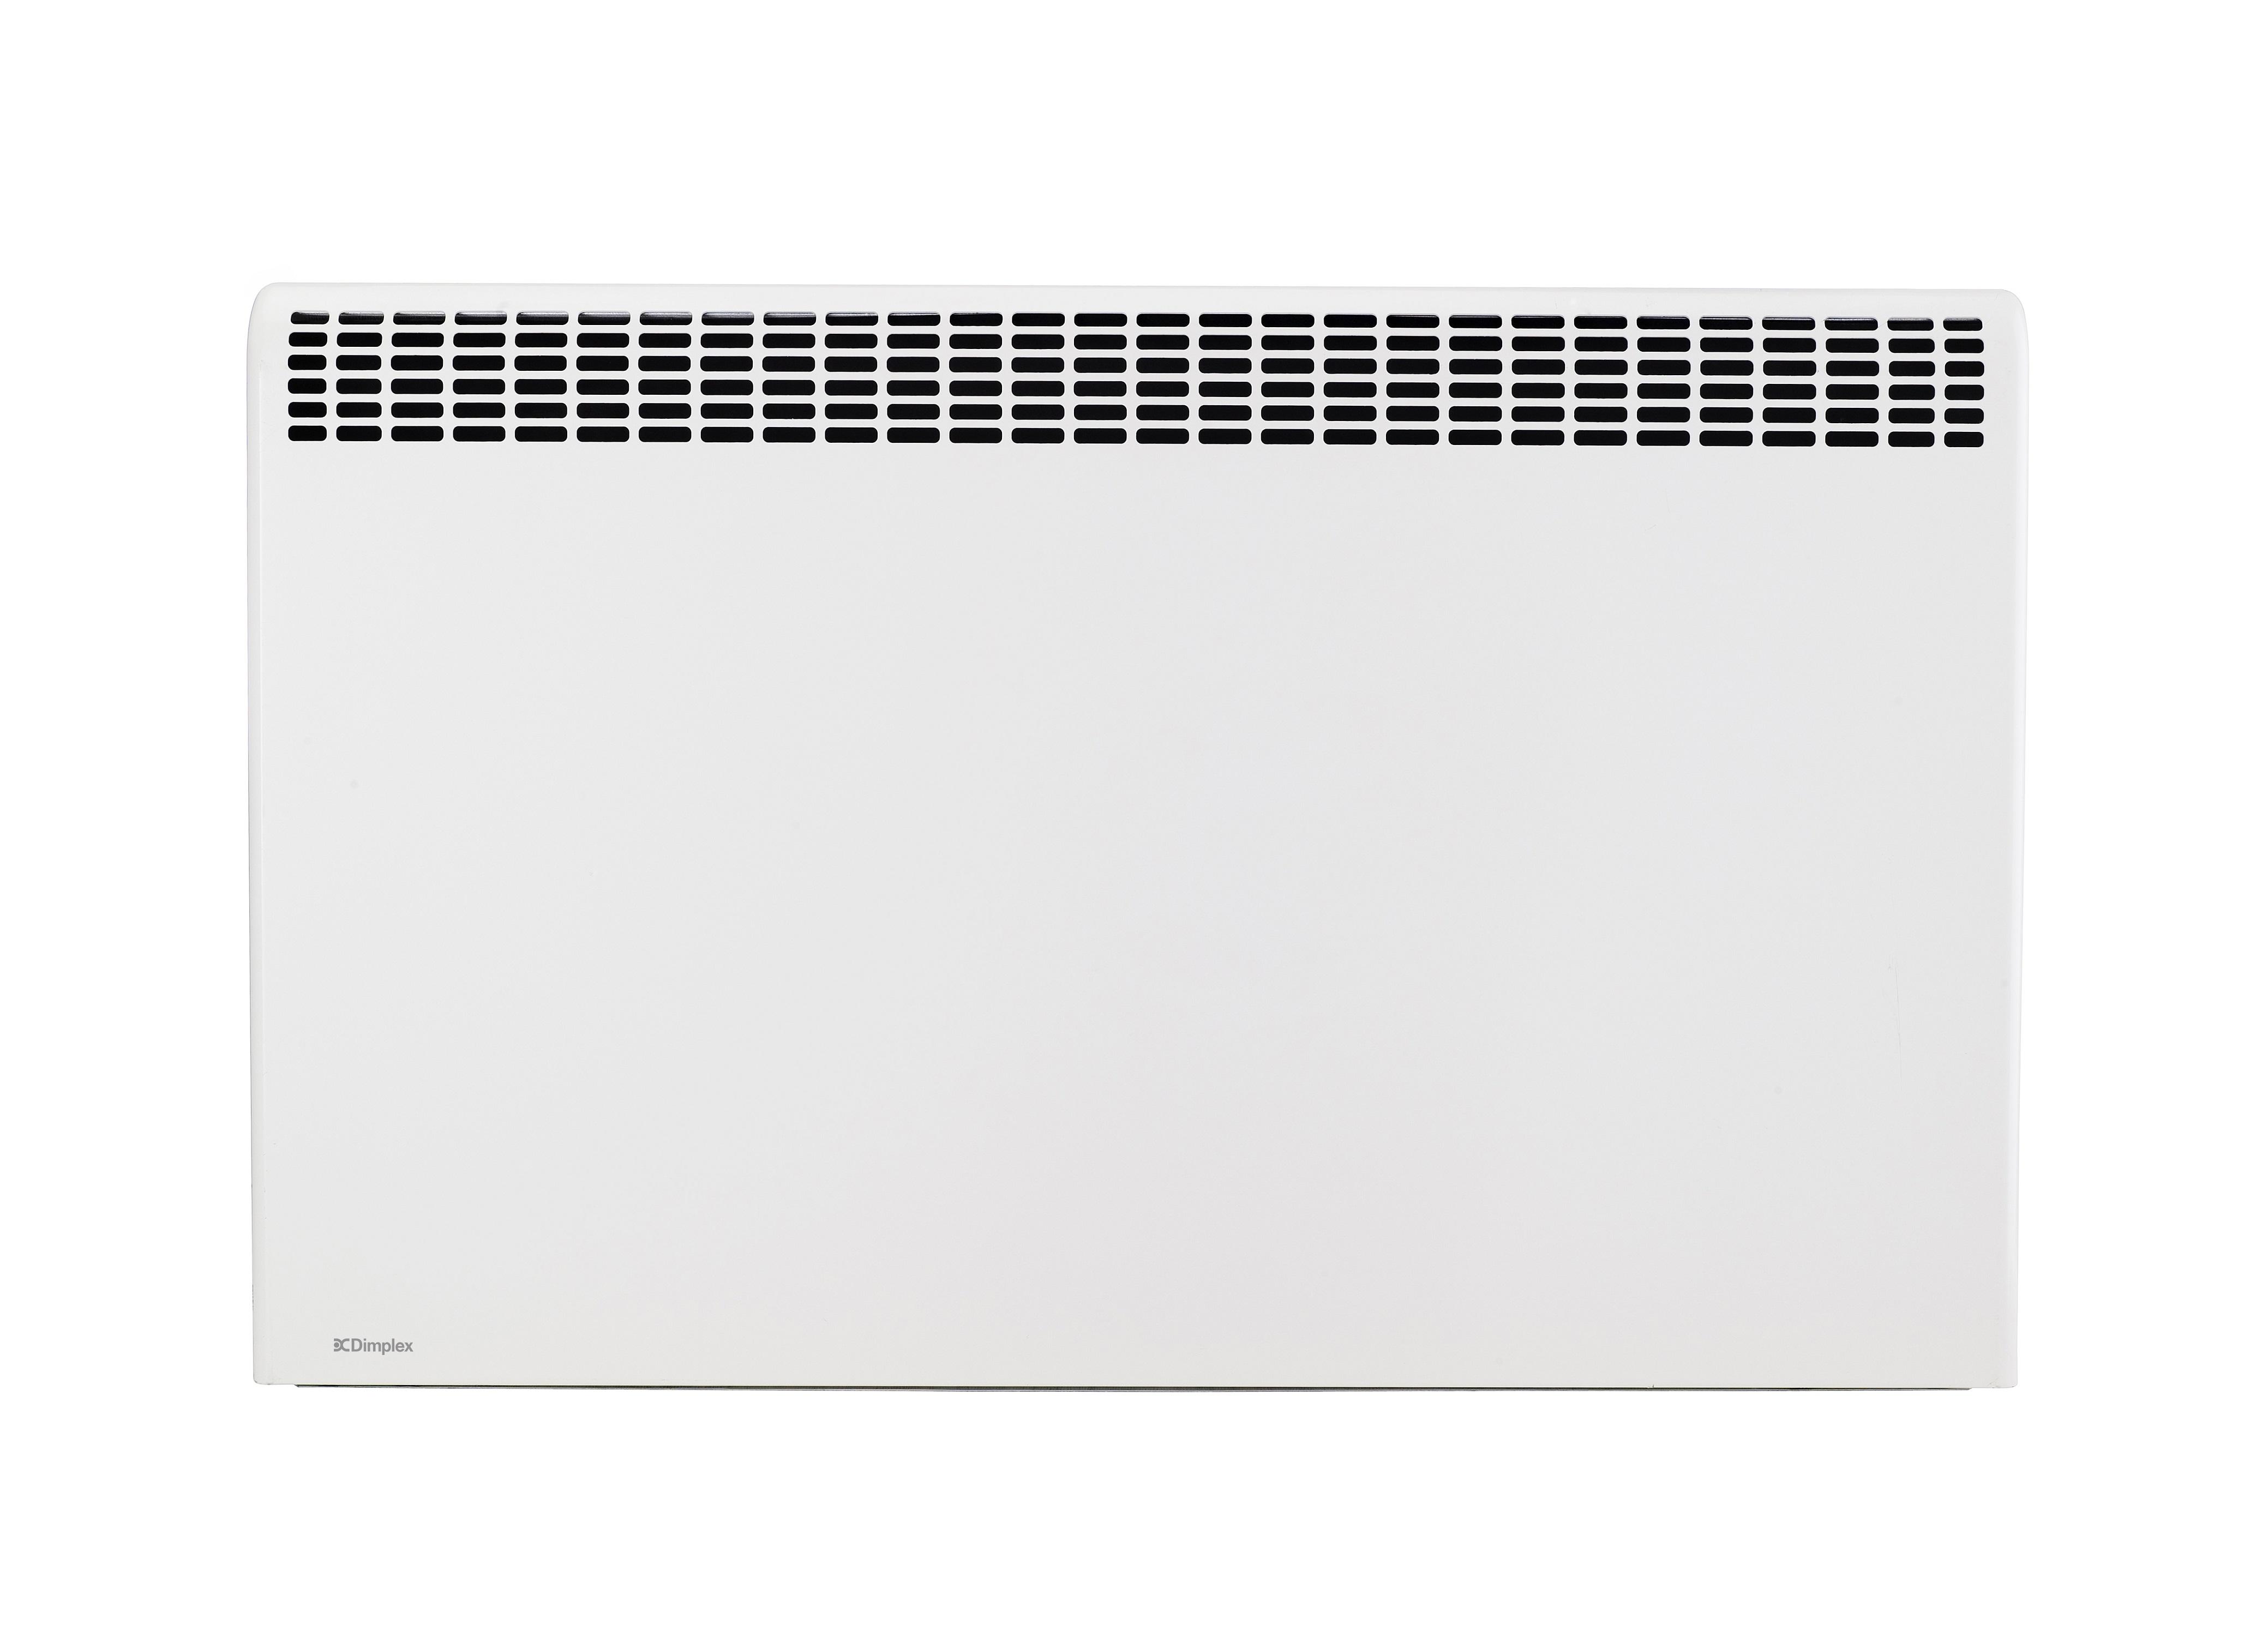 Dimplex Comfort Panelovn 1200W 40cm (5468544)